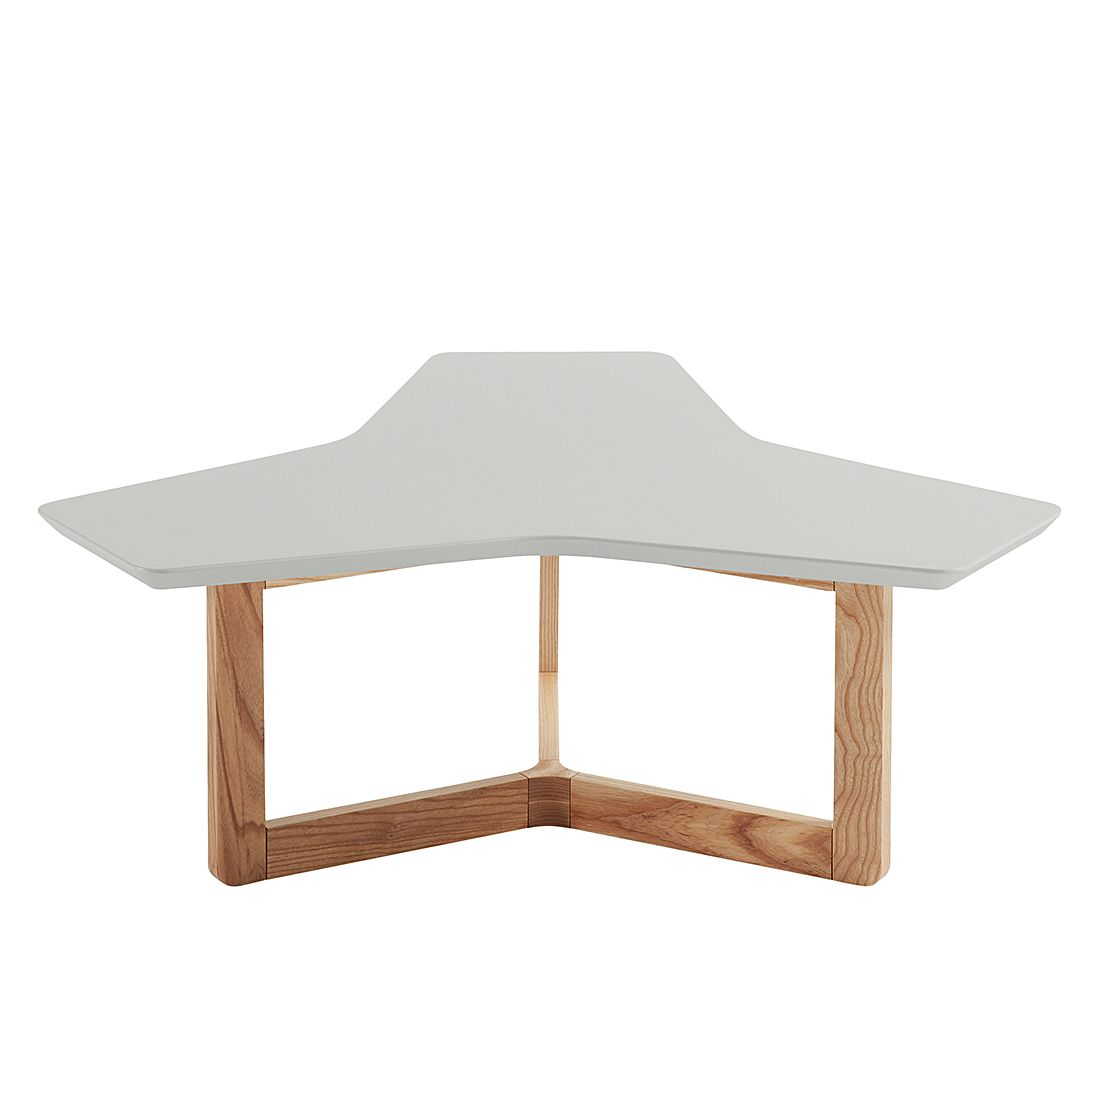 Table basse Larne - Gris mat / Frêne, Morteens